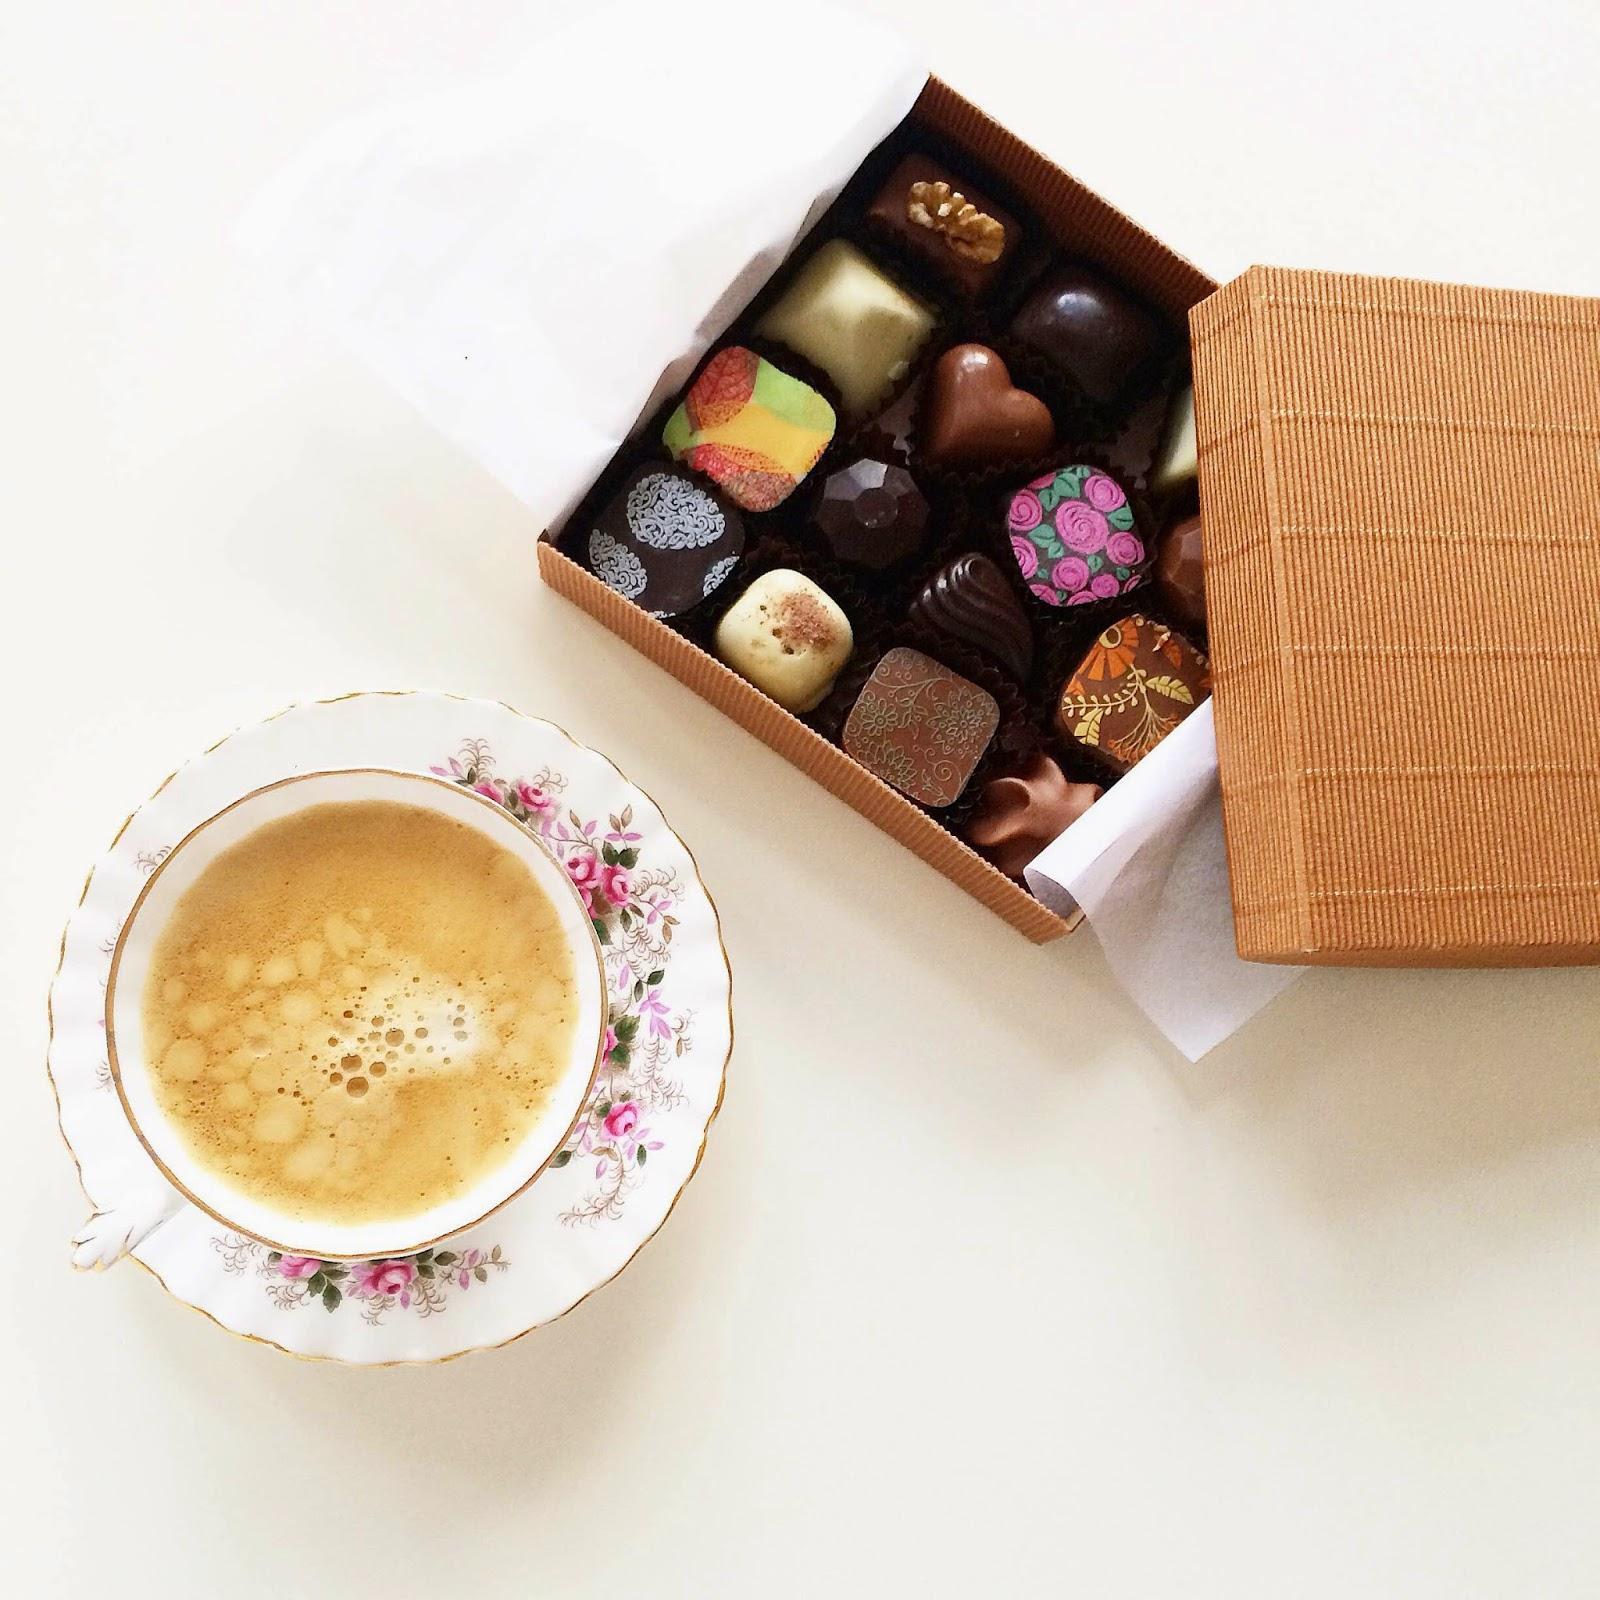 kristjaana mere instagram espresso handmade anneli viik chocolates